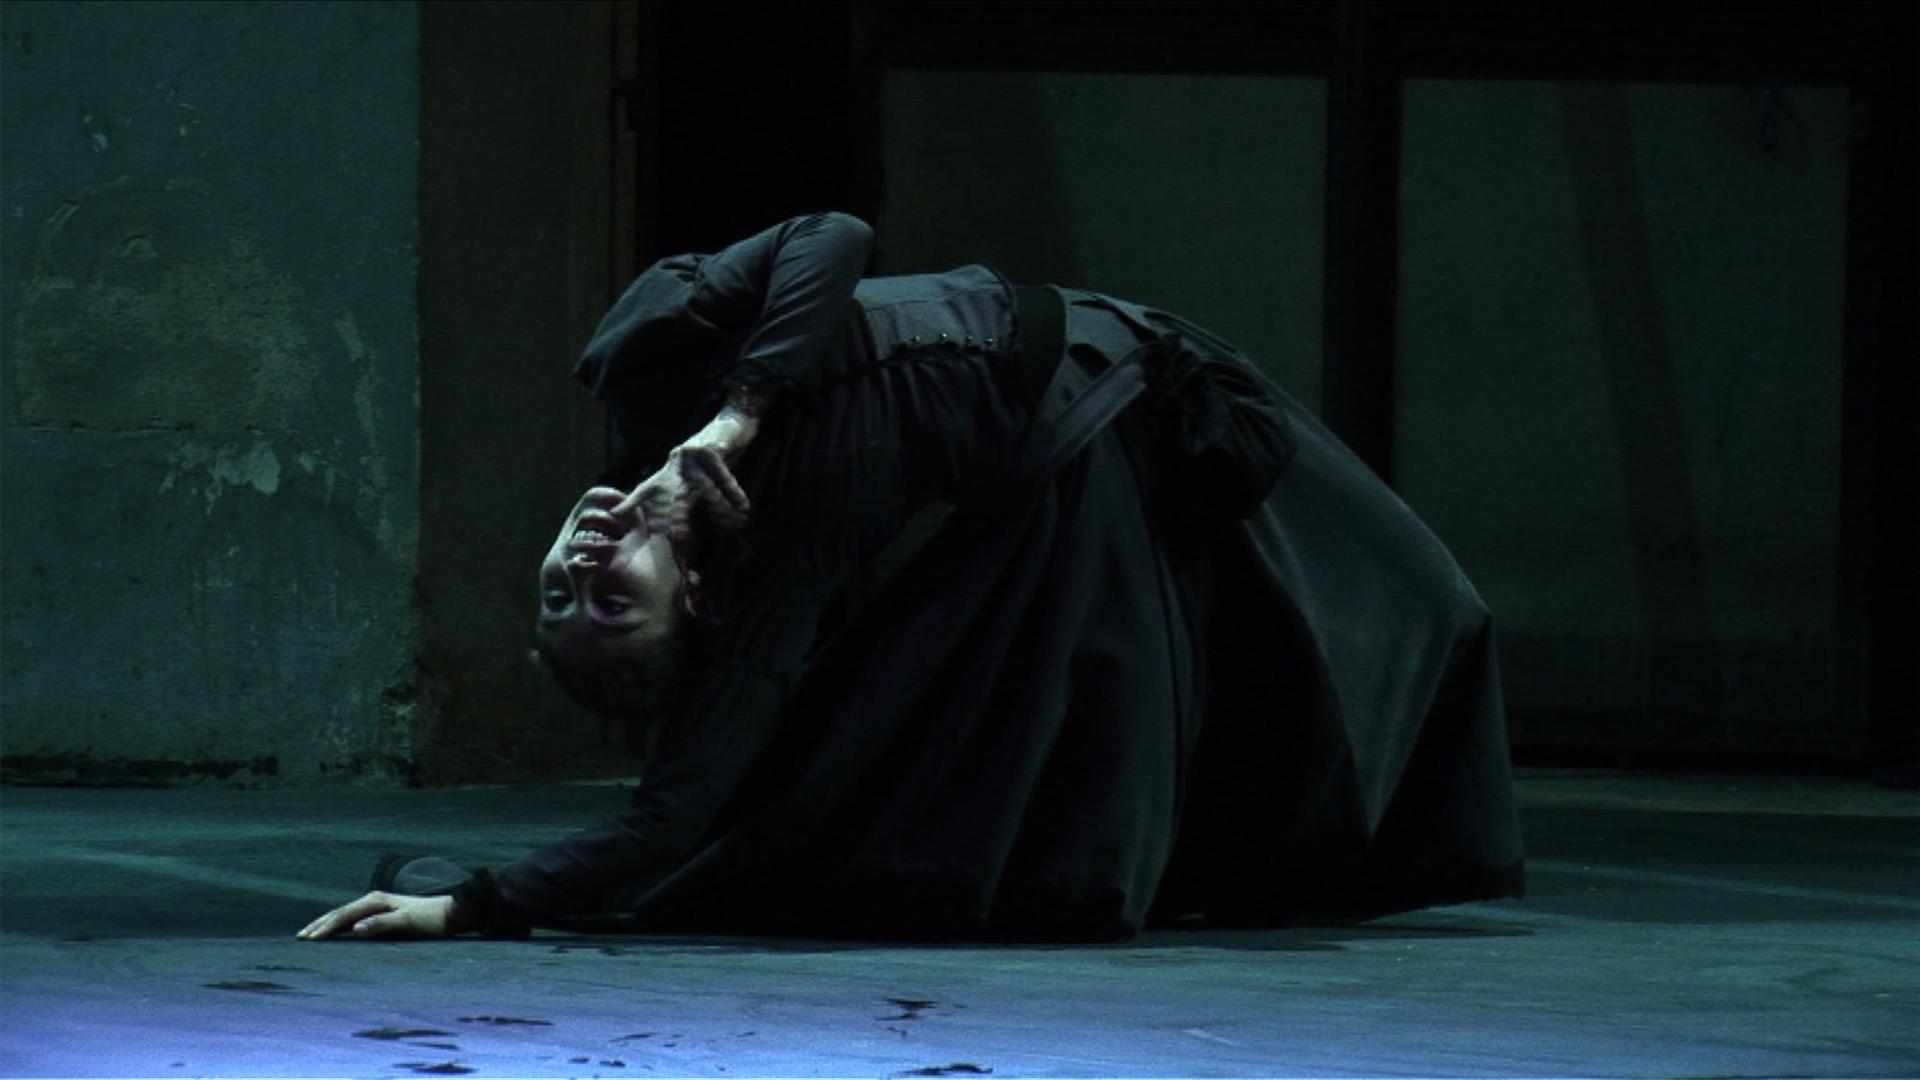 © Zikzira Physical Theatre, Eu vos Liberto, Macarena Campbell, Brazil, 2008, Photo Andre Semenza .jpg